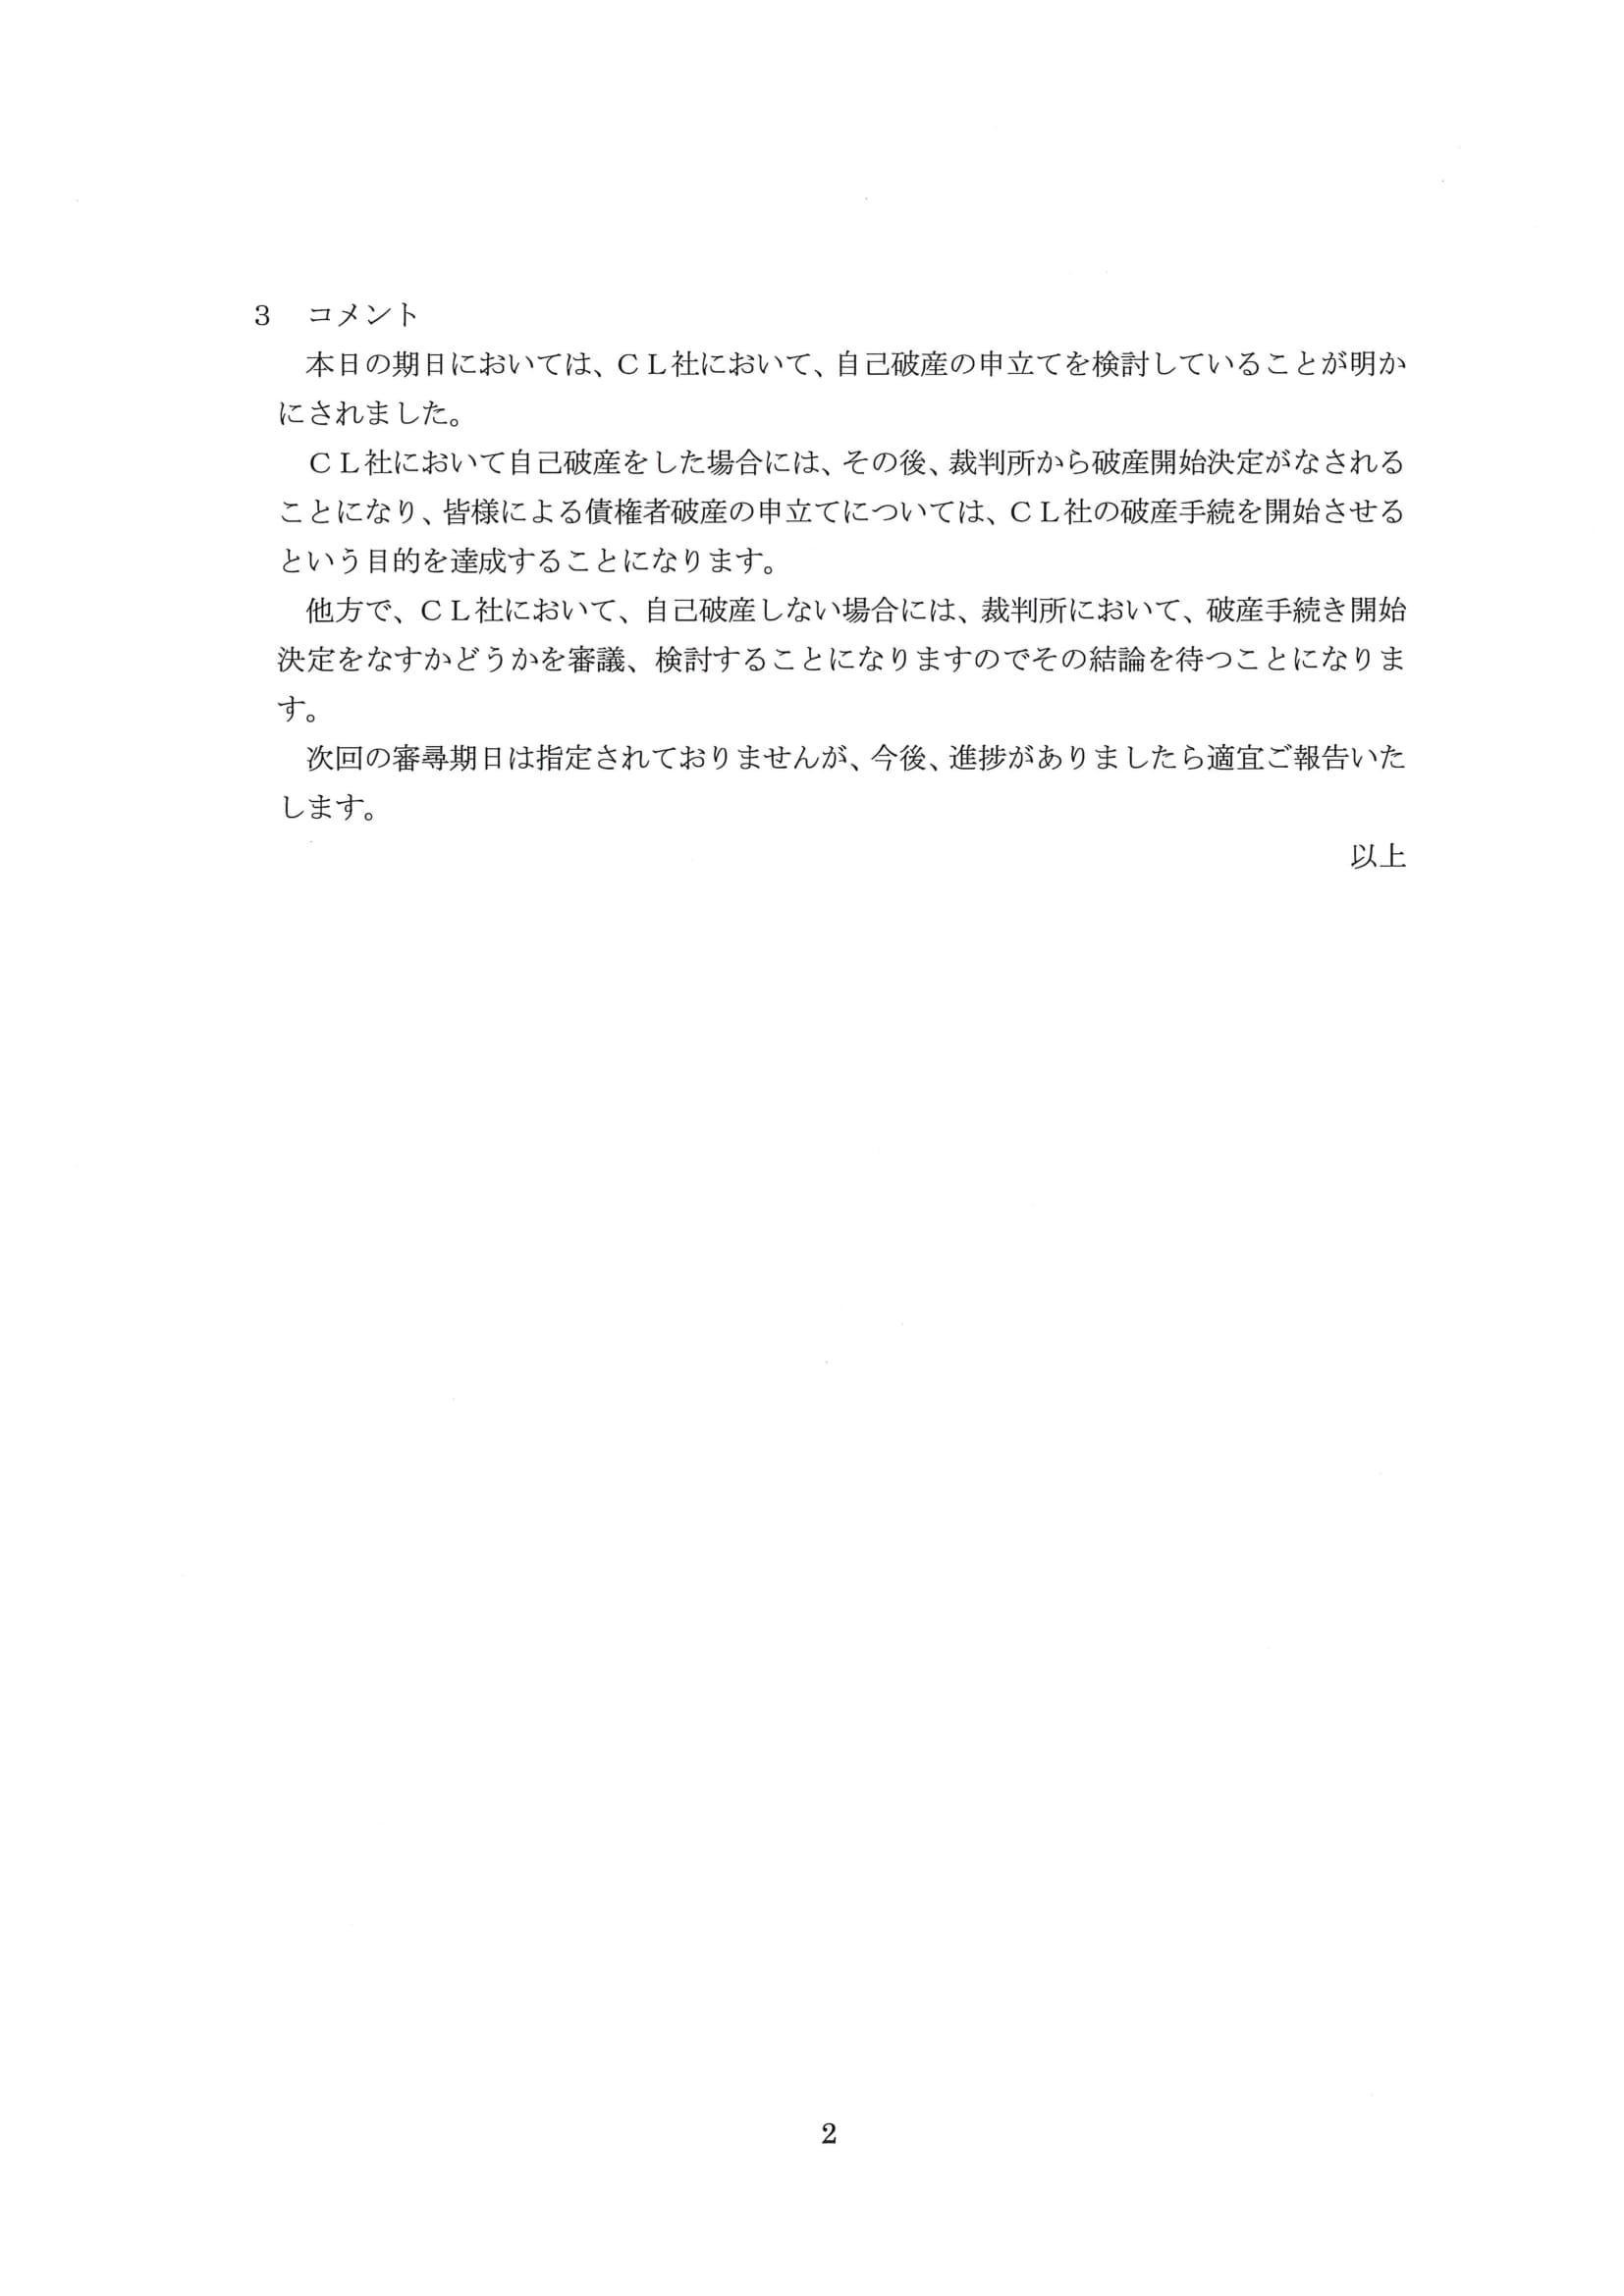 【CL破産申立て】期日報告書(令和2年3月10日)-2